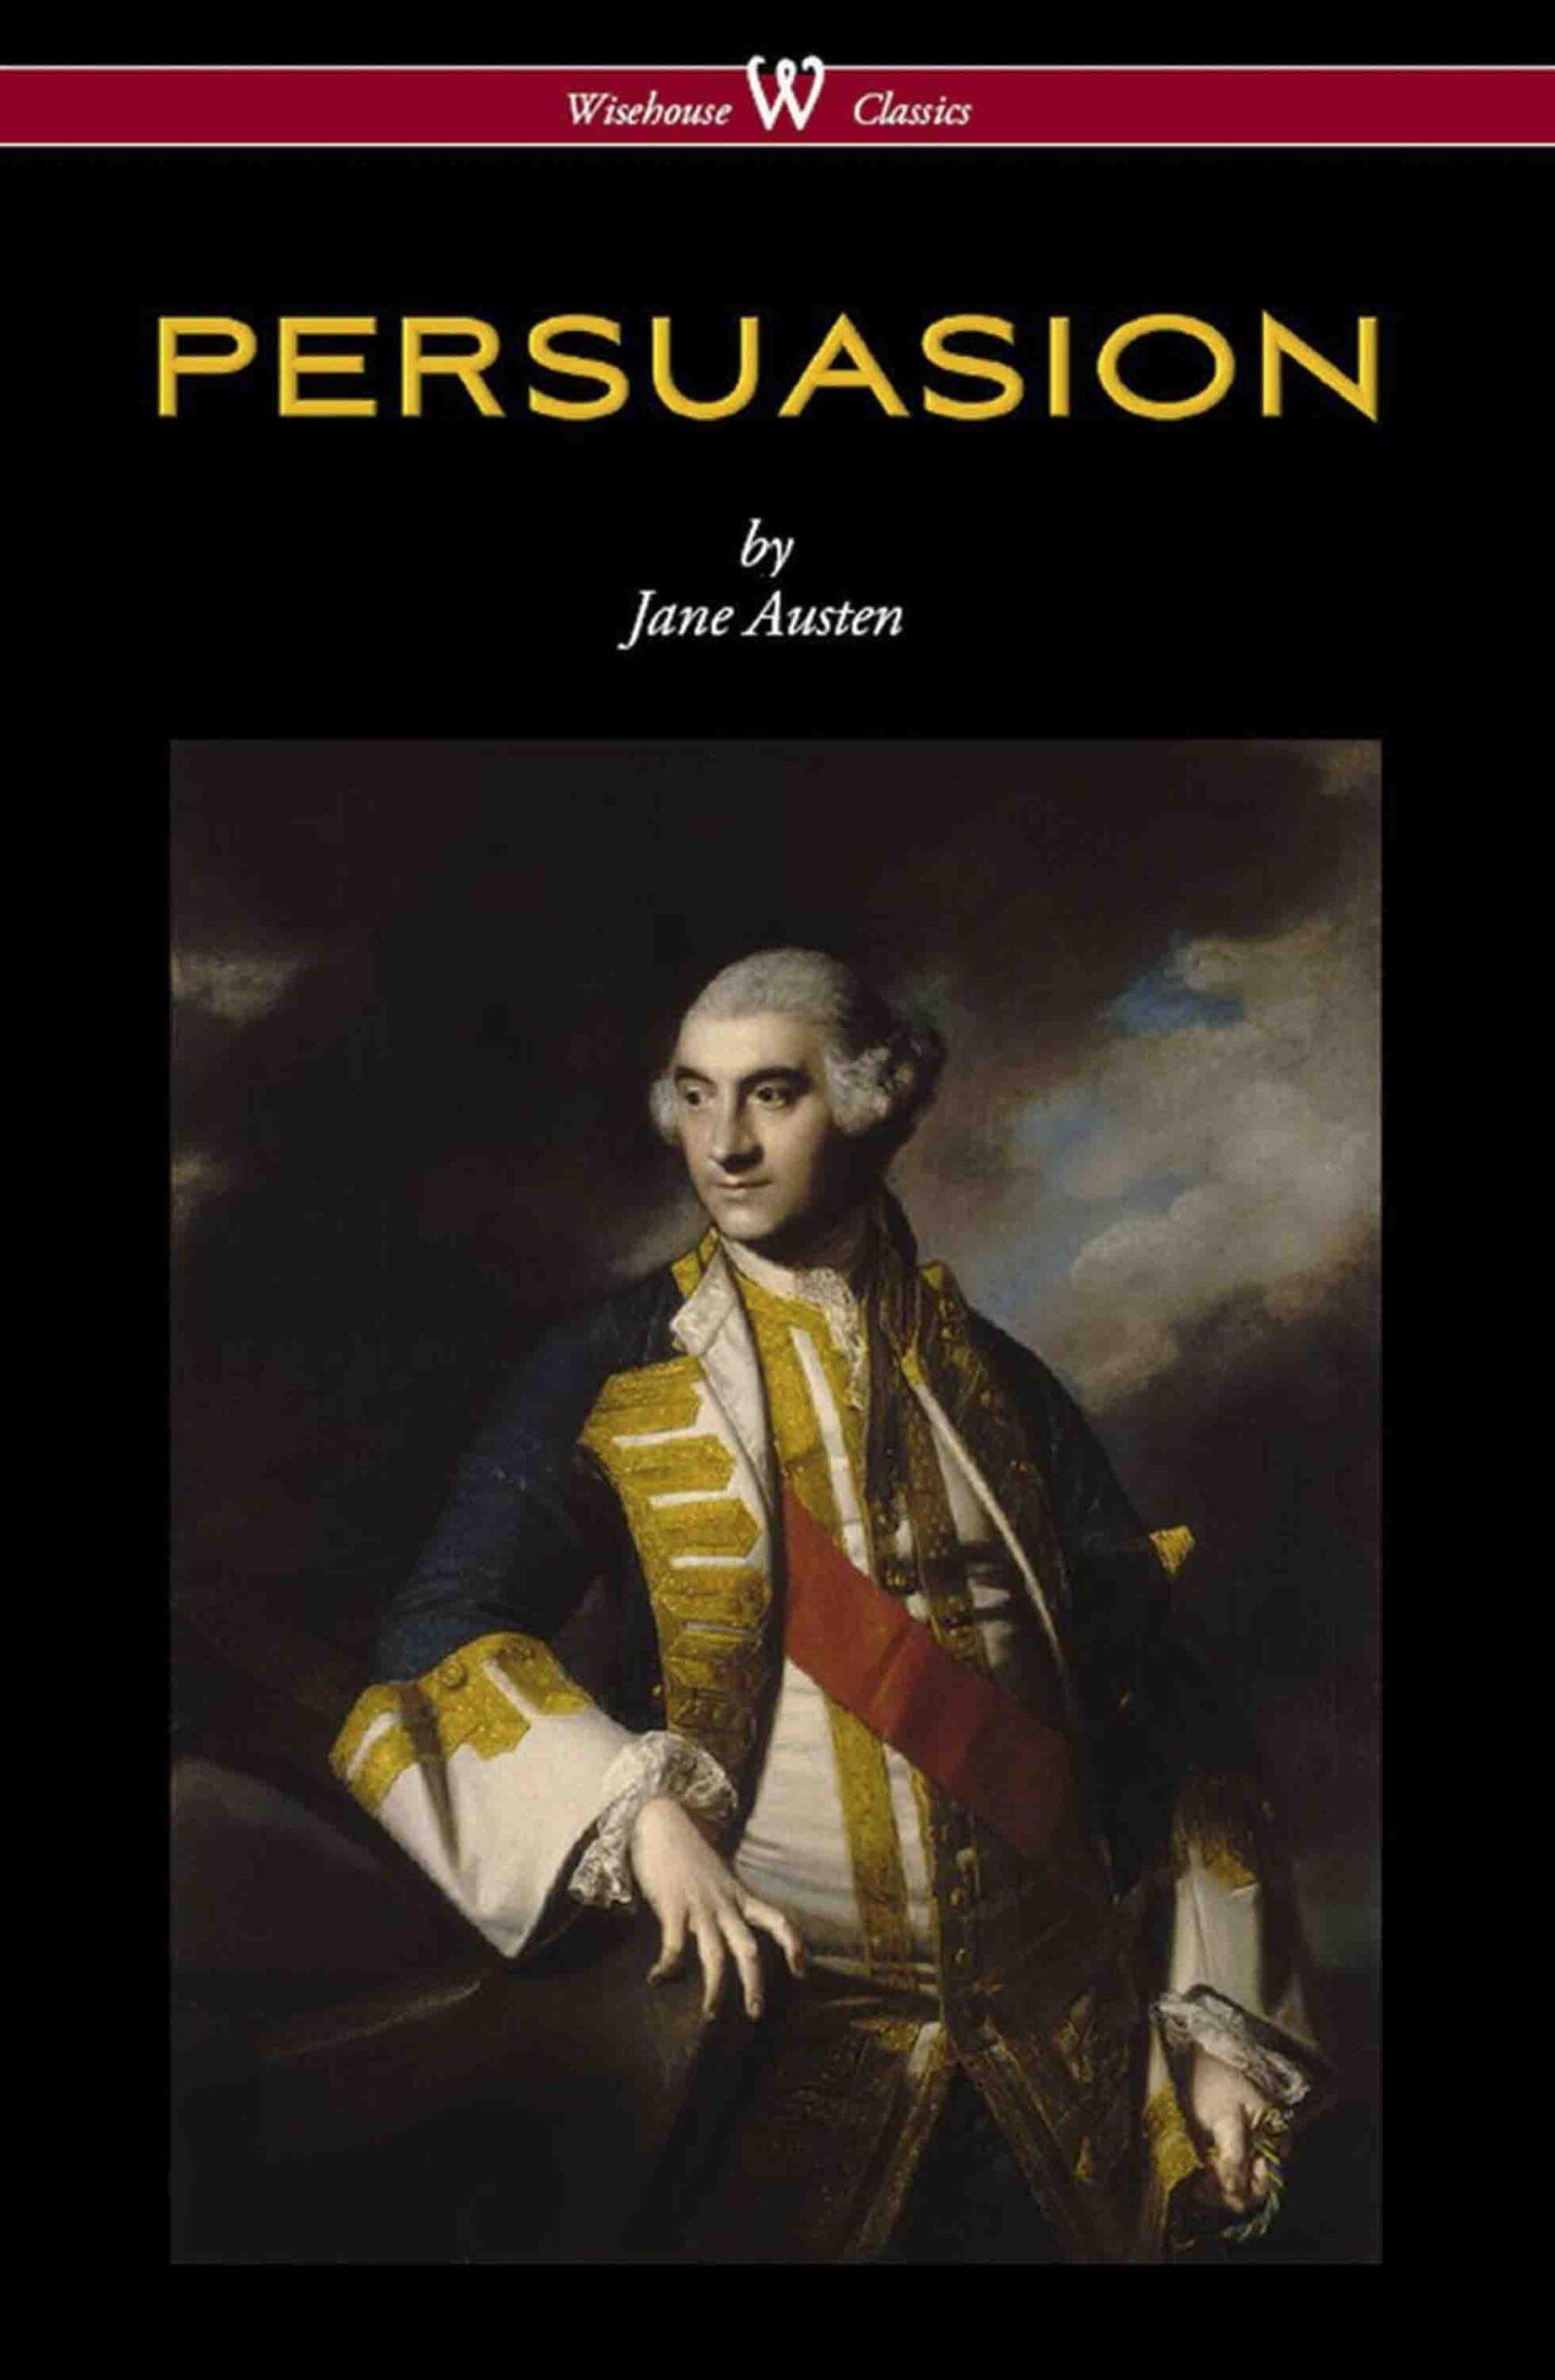 Persuasion (Wisehouse Classics Edition)